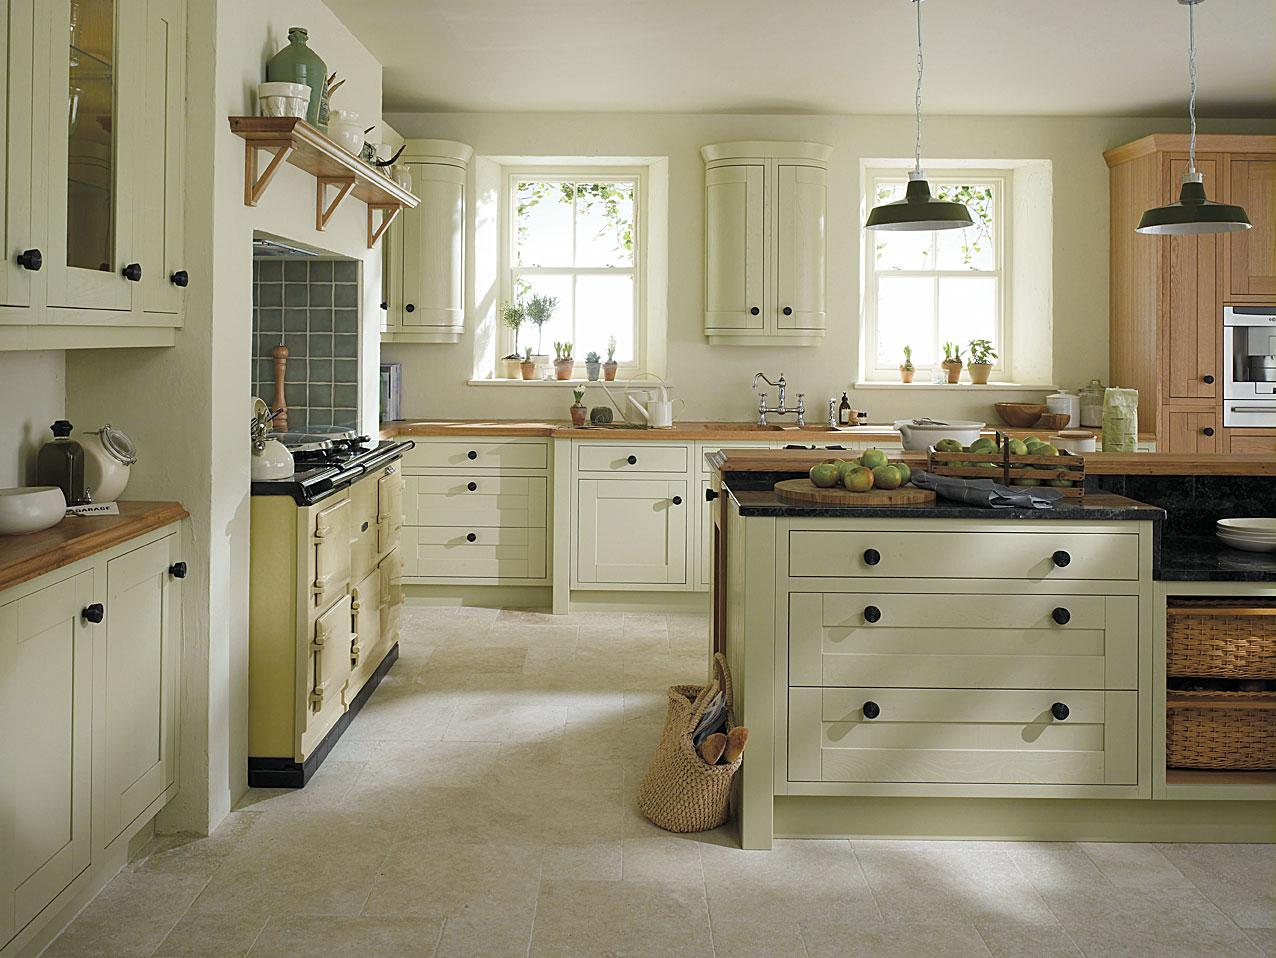 30 Popular Traditional Kitchen Design Ideas on Traditional Kitchen Decor  id=16313